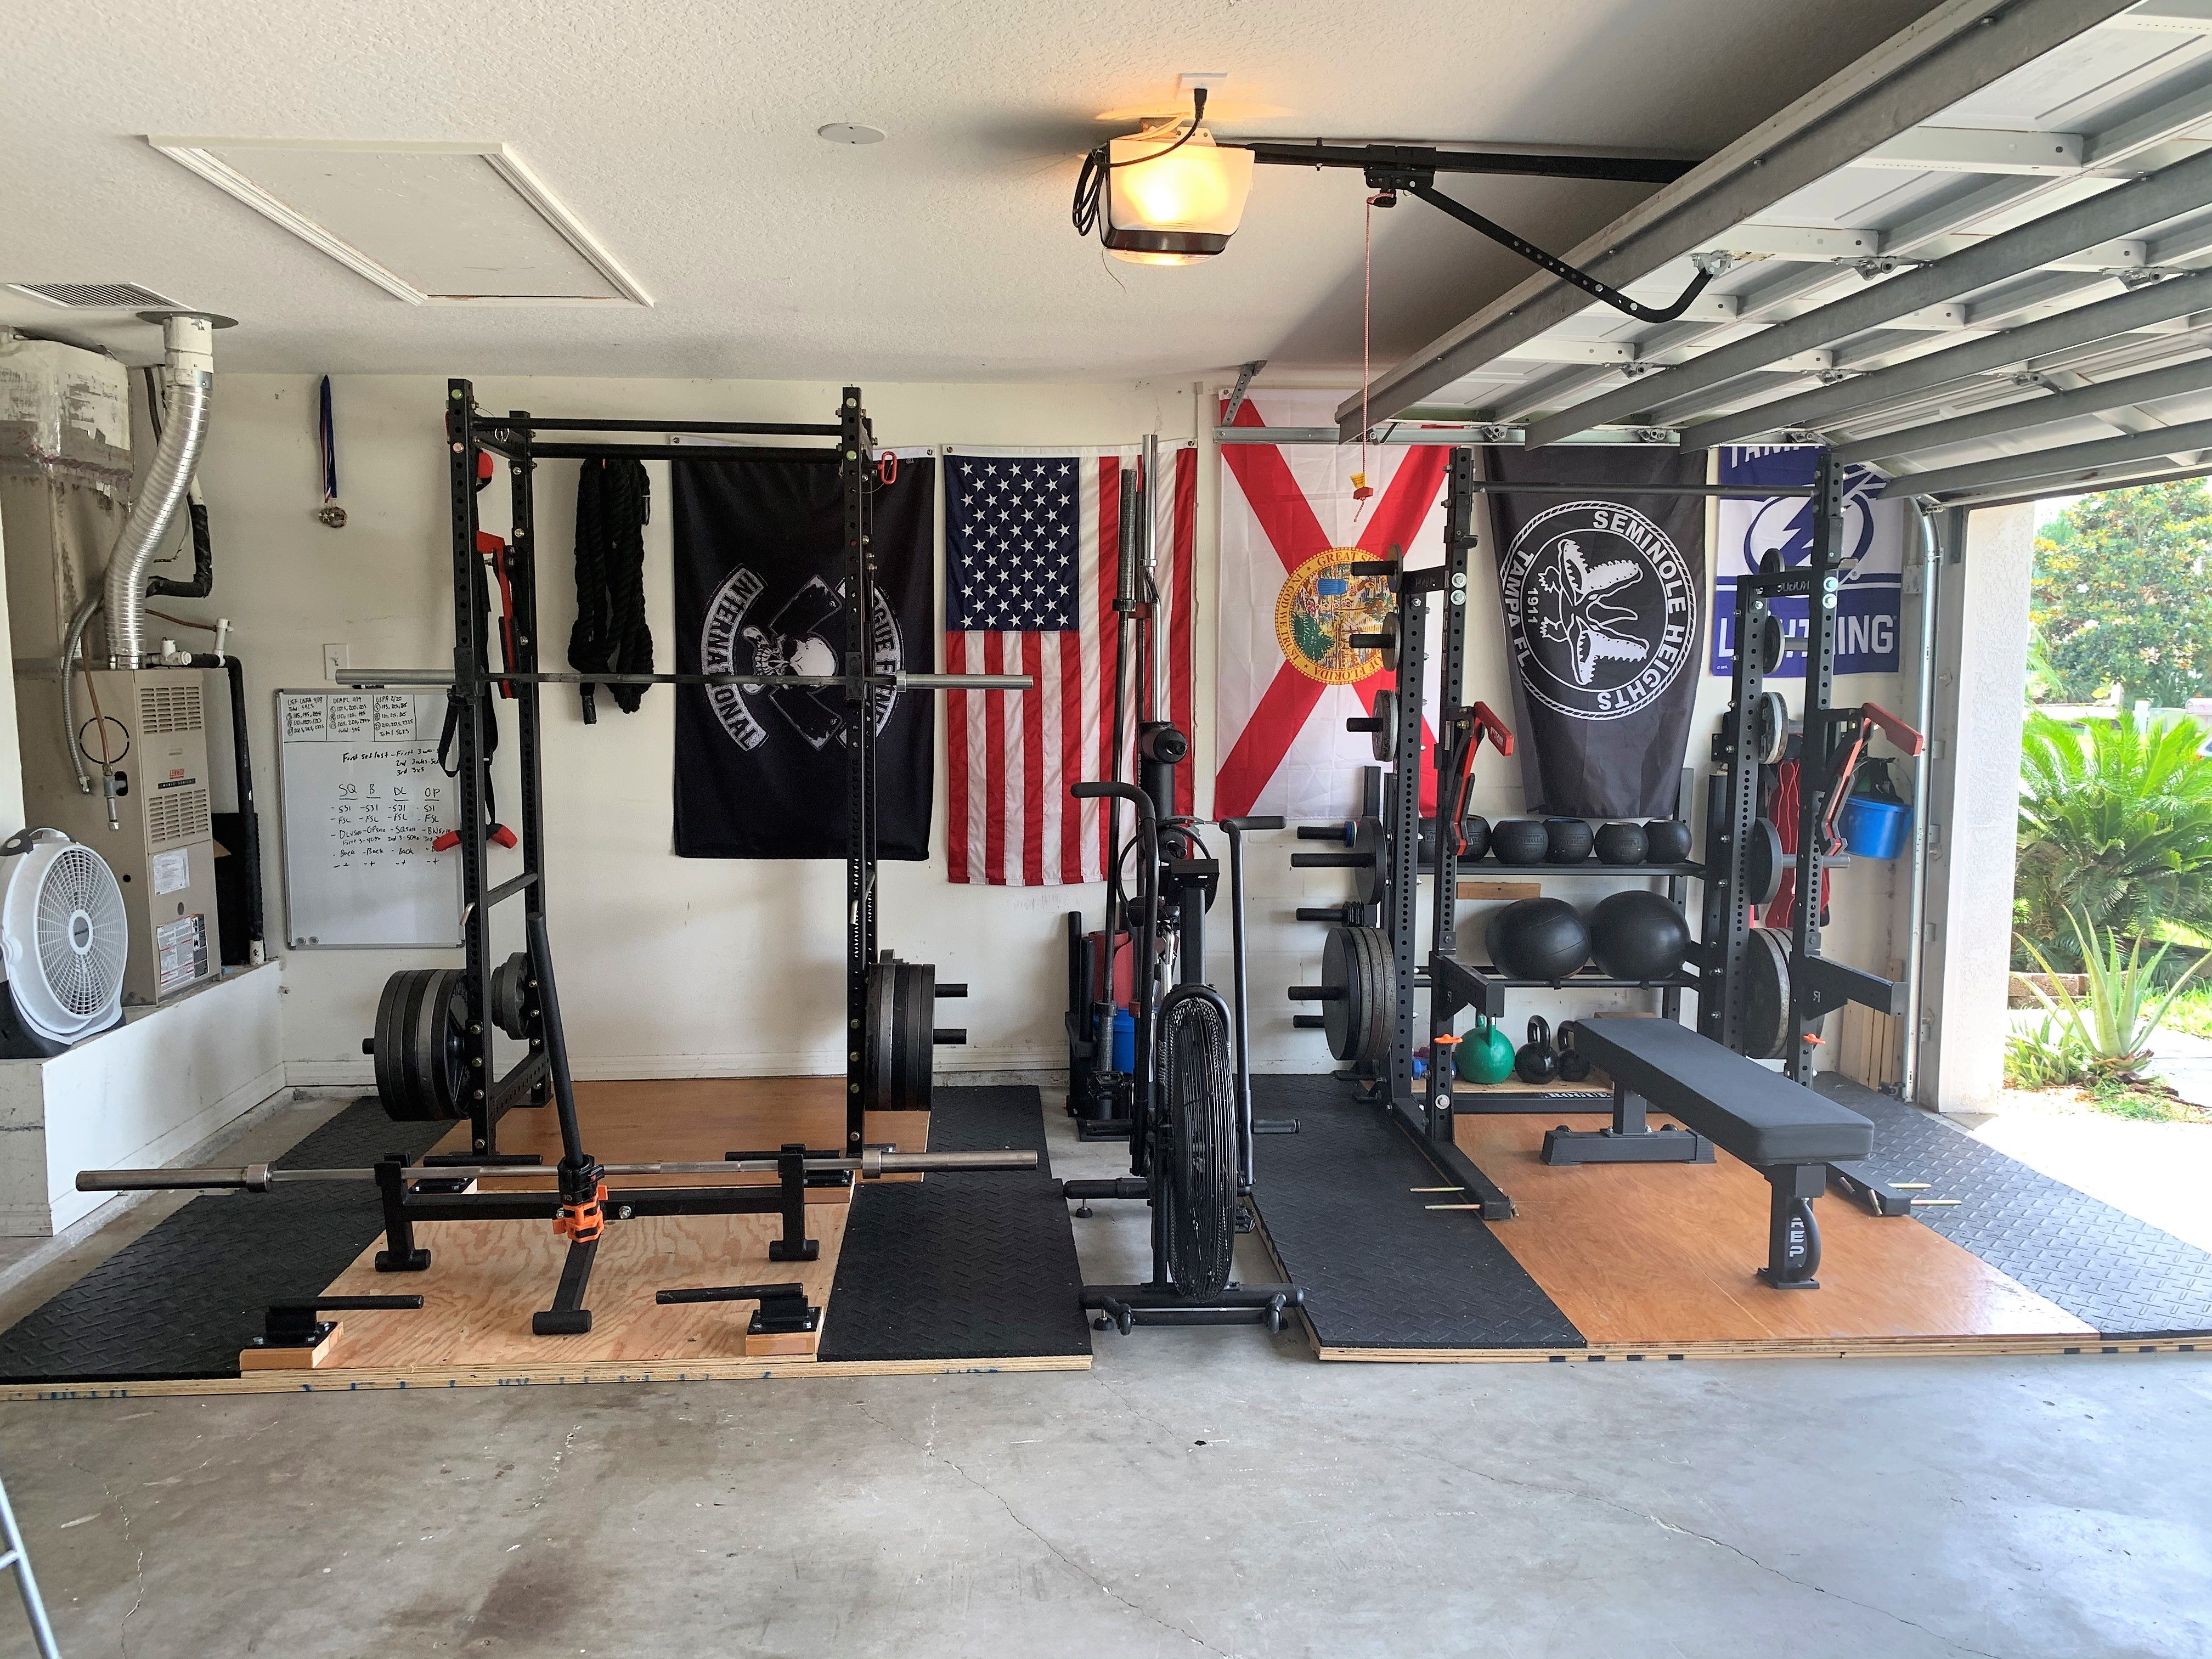 Double Rack Garage Gym Gym Room At Home Home Gym Garage Workout Room Home